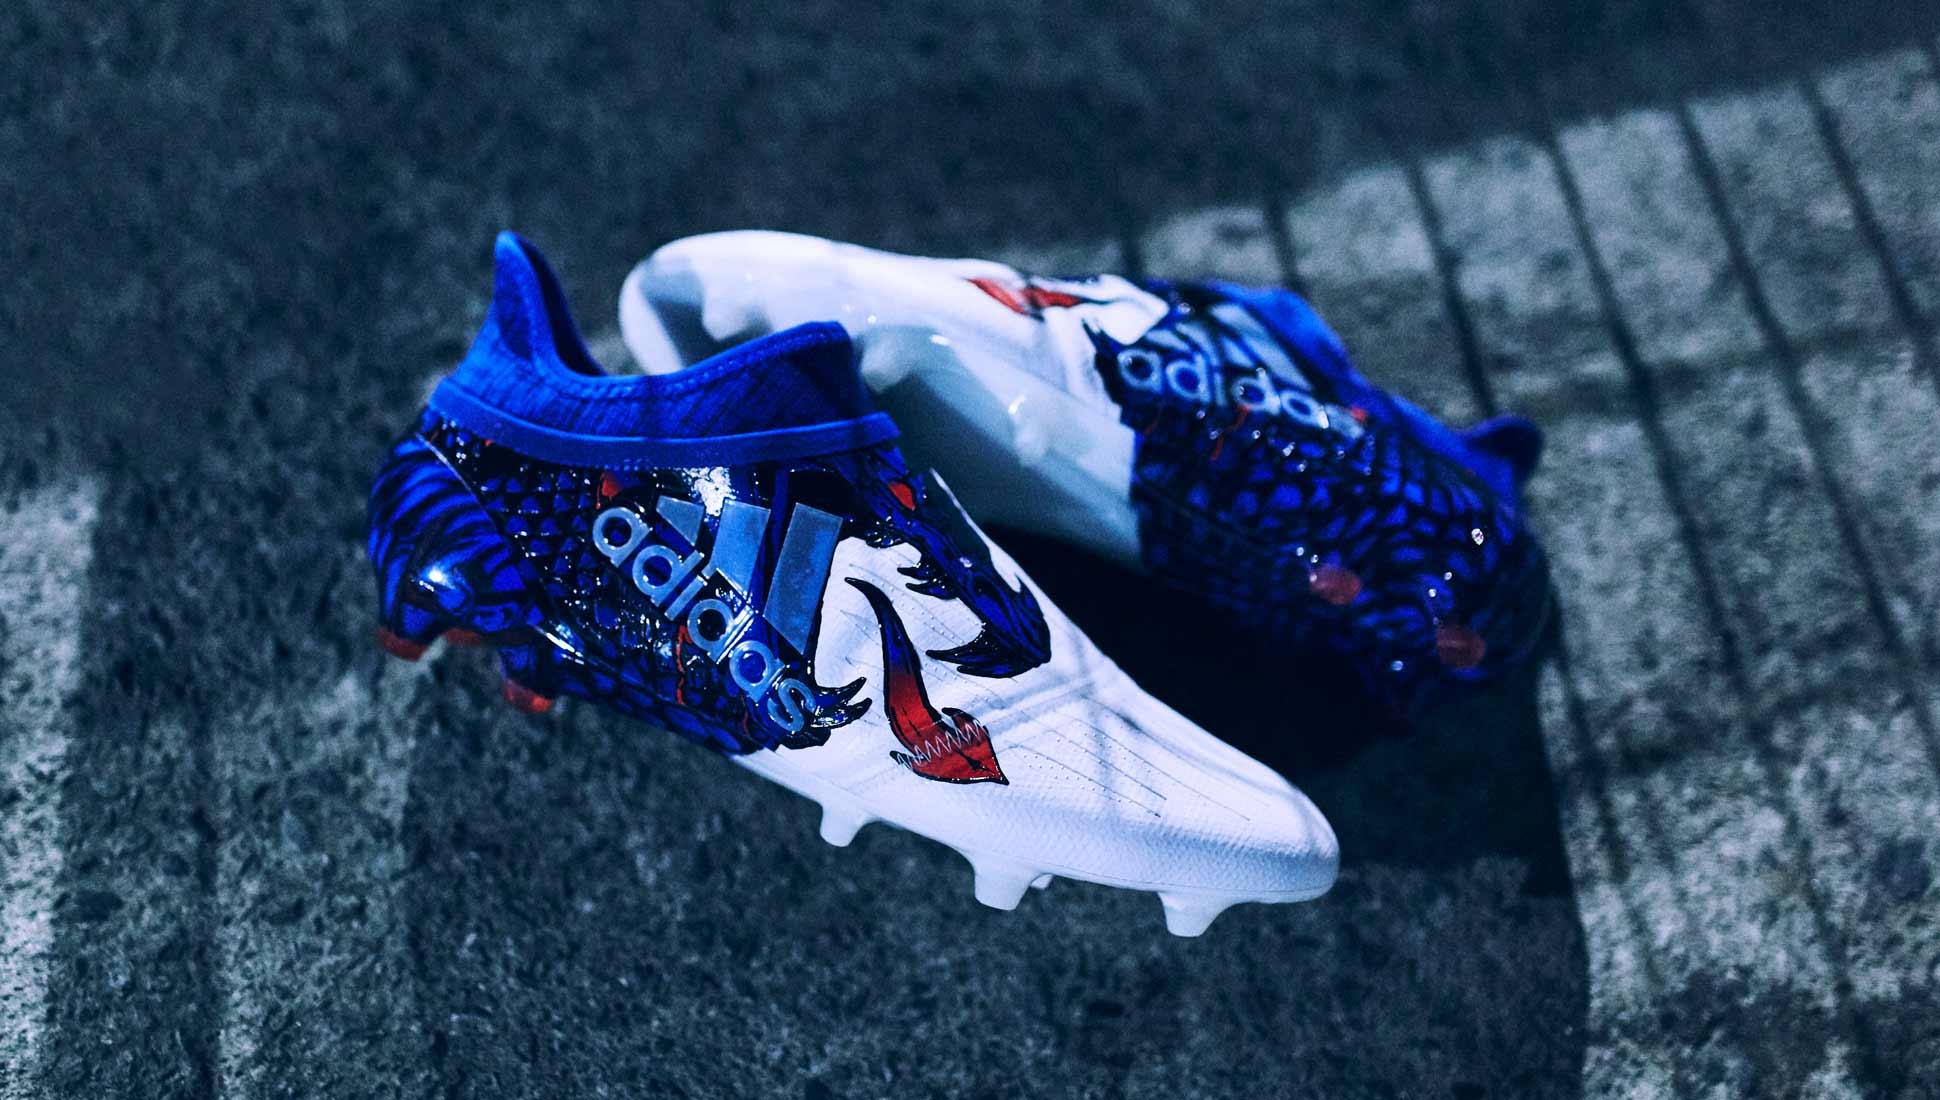 Adidas X 16 Purechaos Ucl Dragon Football Boots Soccerbible